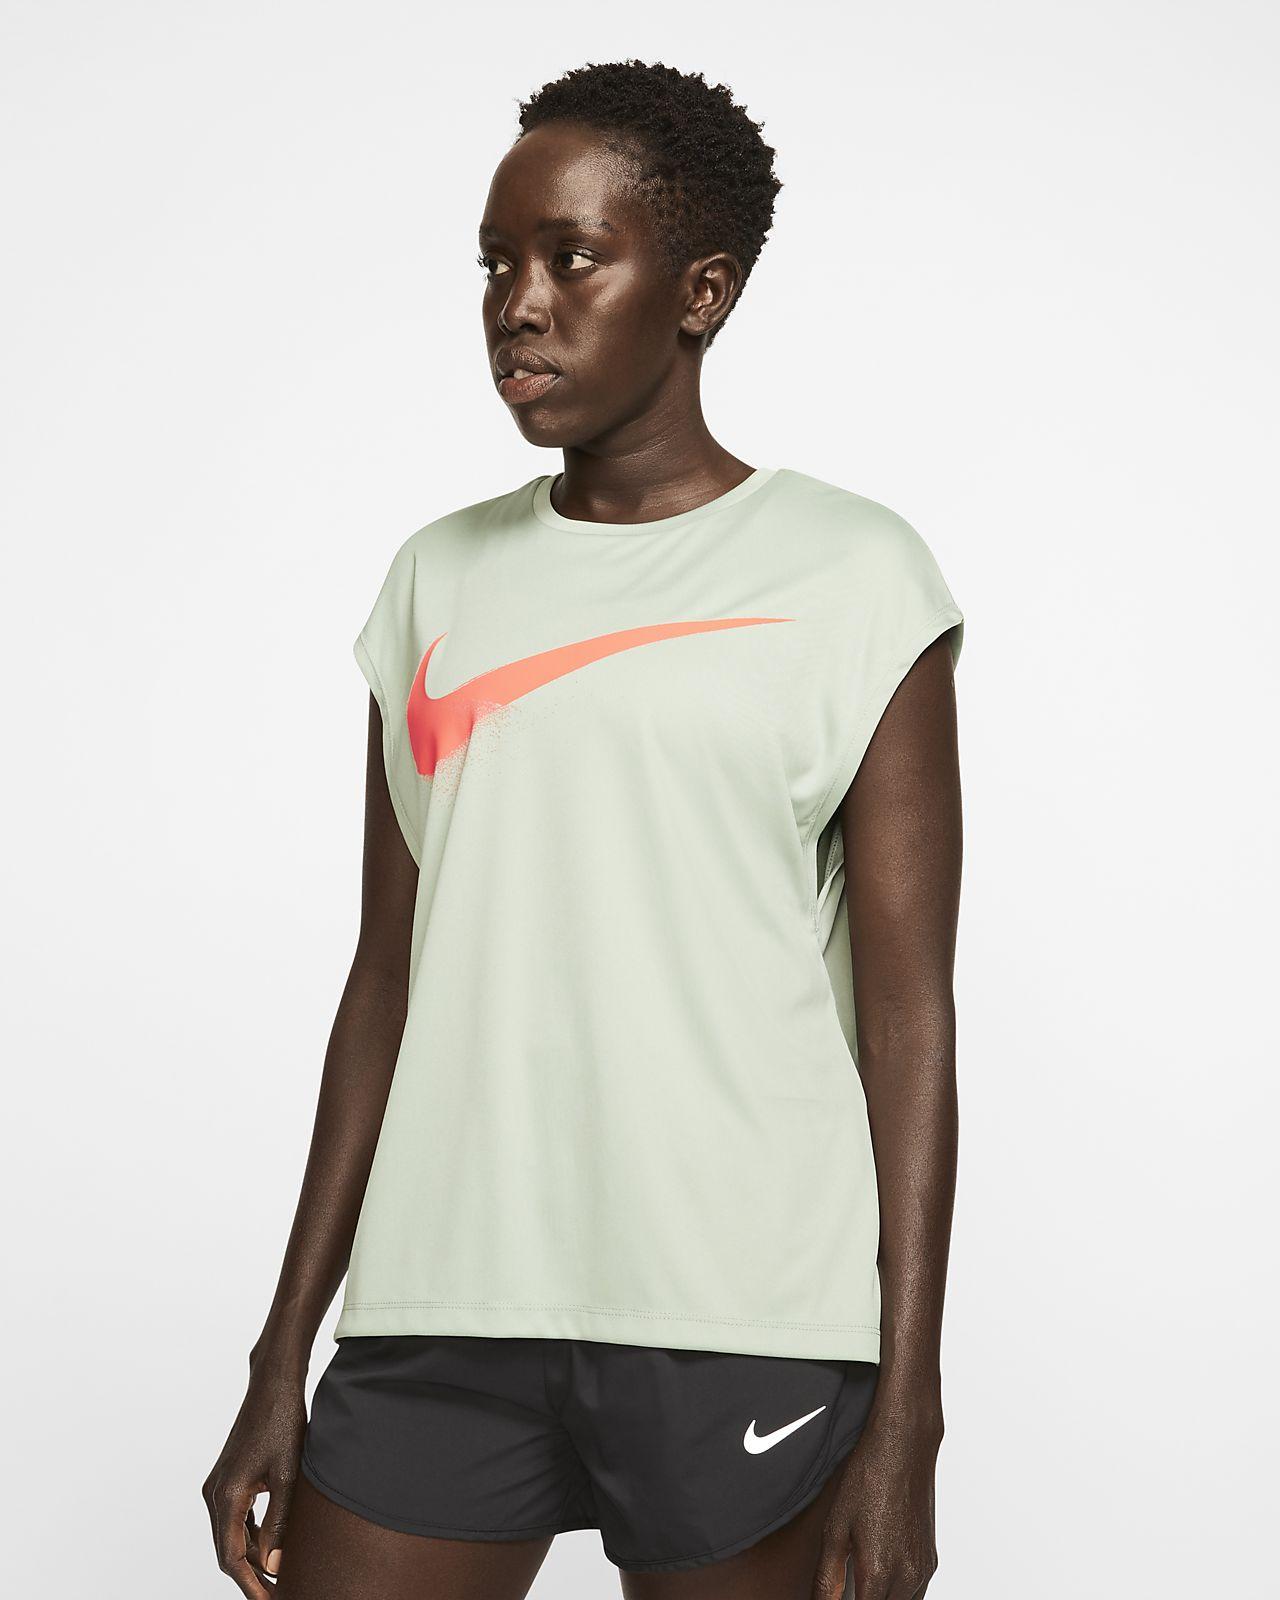 Prenda para la parte superior de running estampada para mujer Nike Dri-FIT